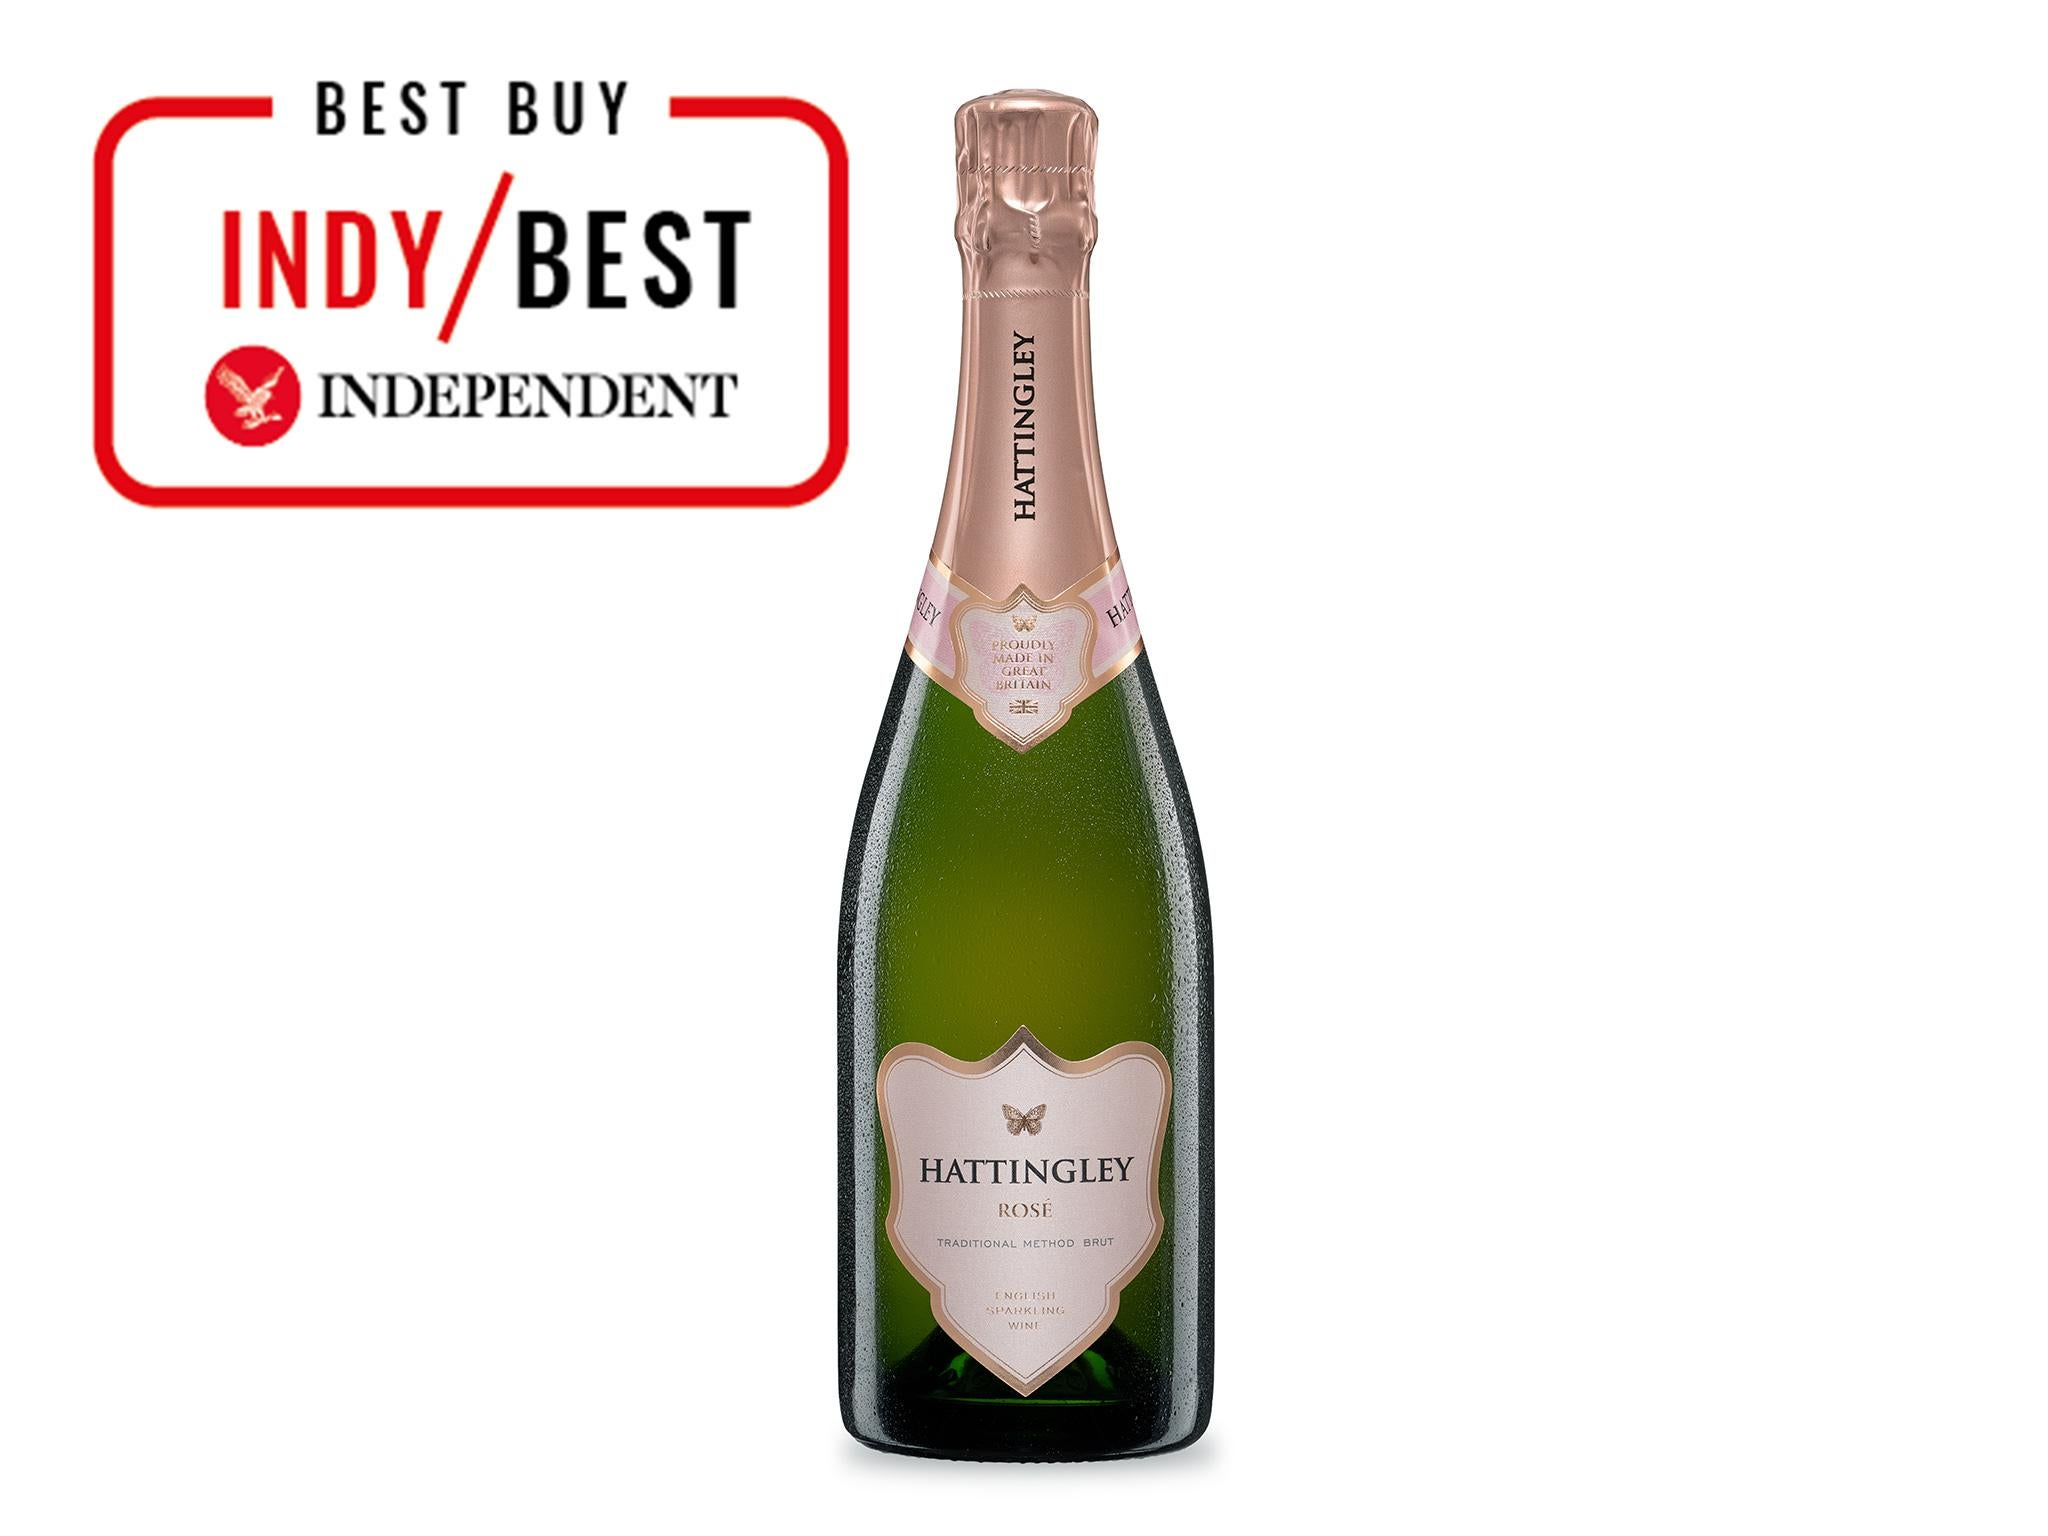 PROSECCO APPRECIATION SOCIETY T-SHIRT bubbly champagne cava alcohol drink gift